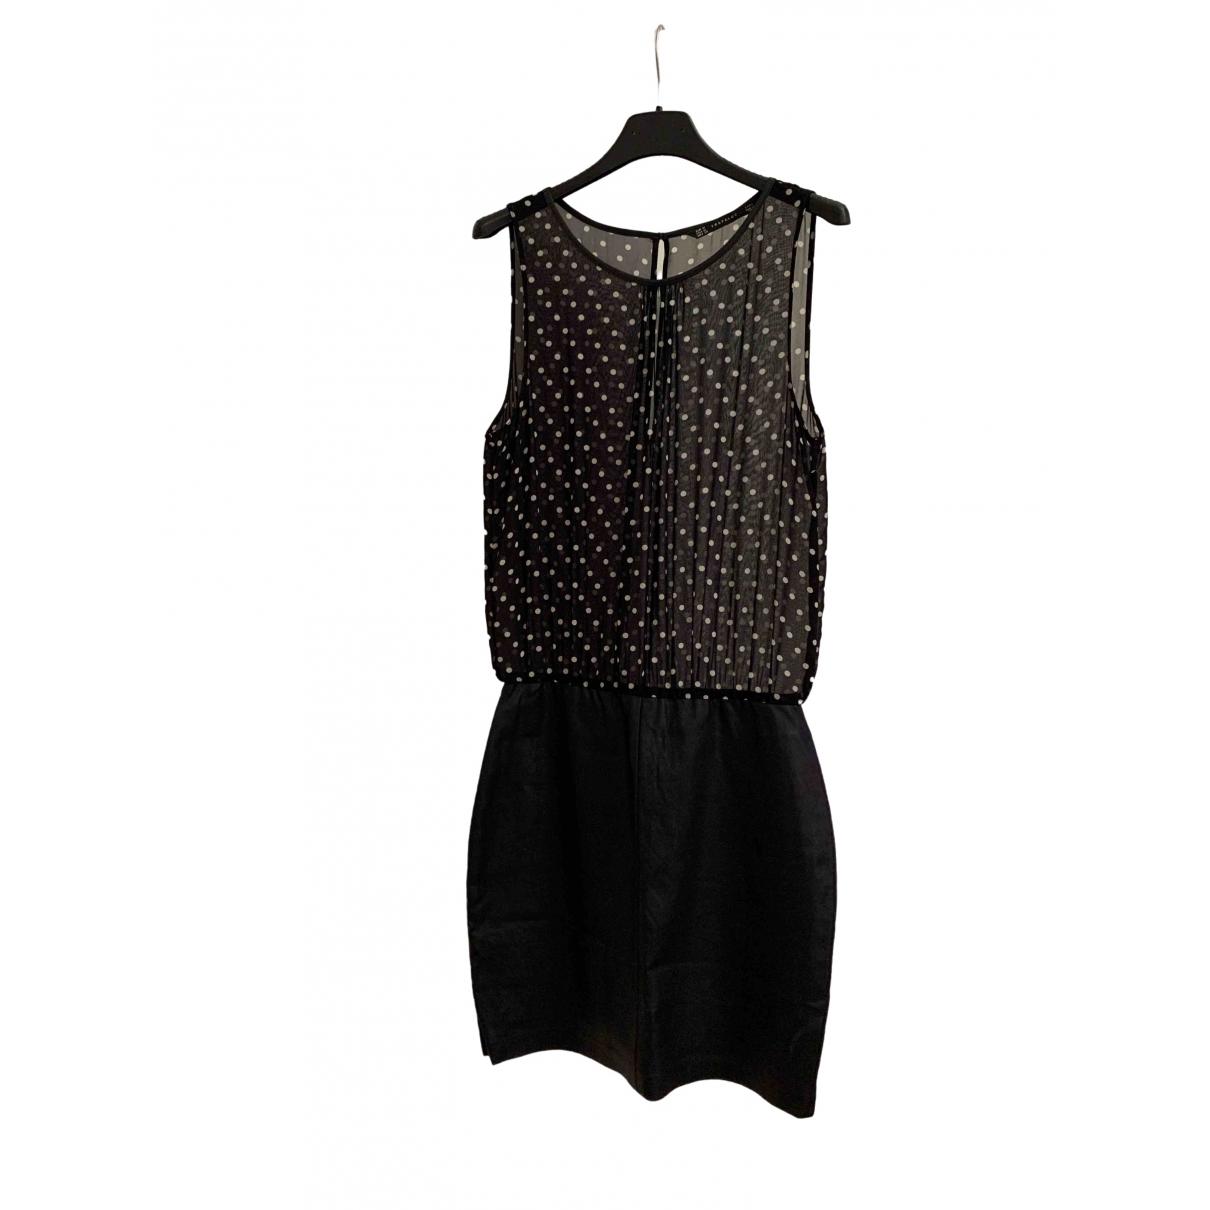 Zara \N Black Leather dress for Women M International